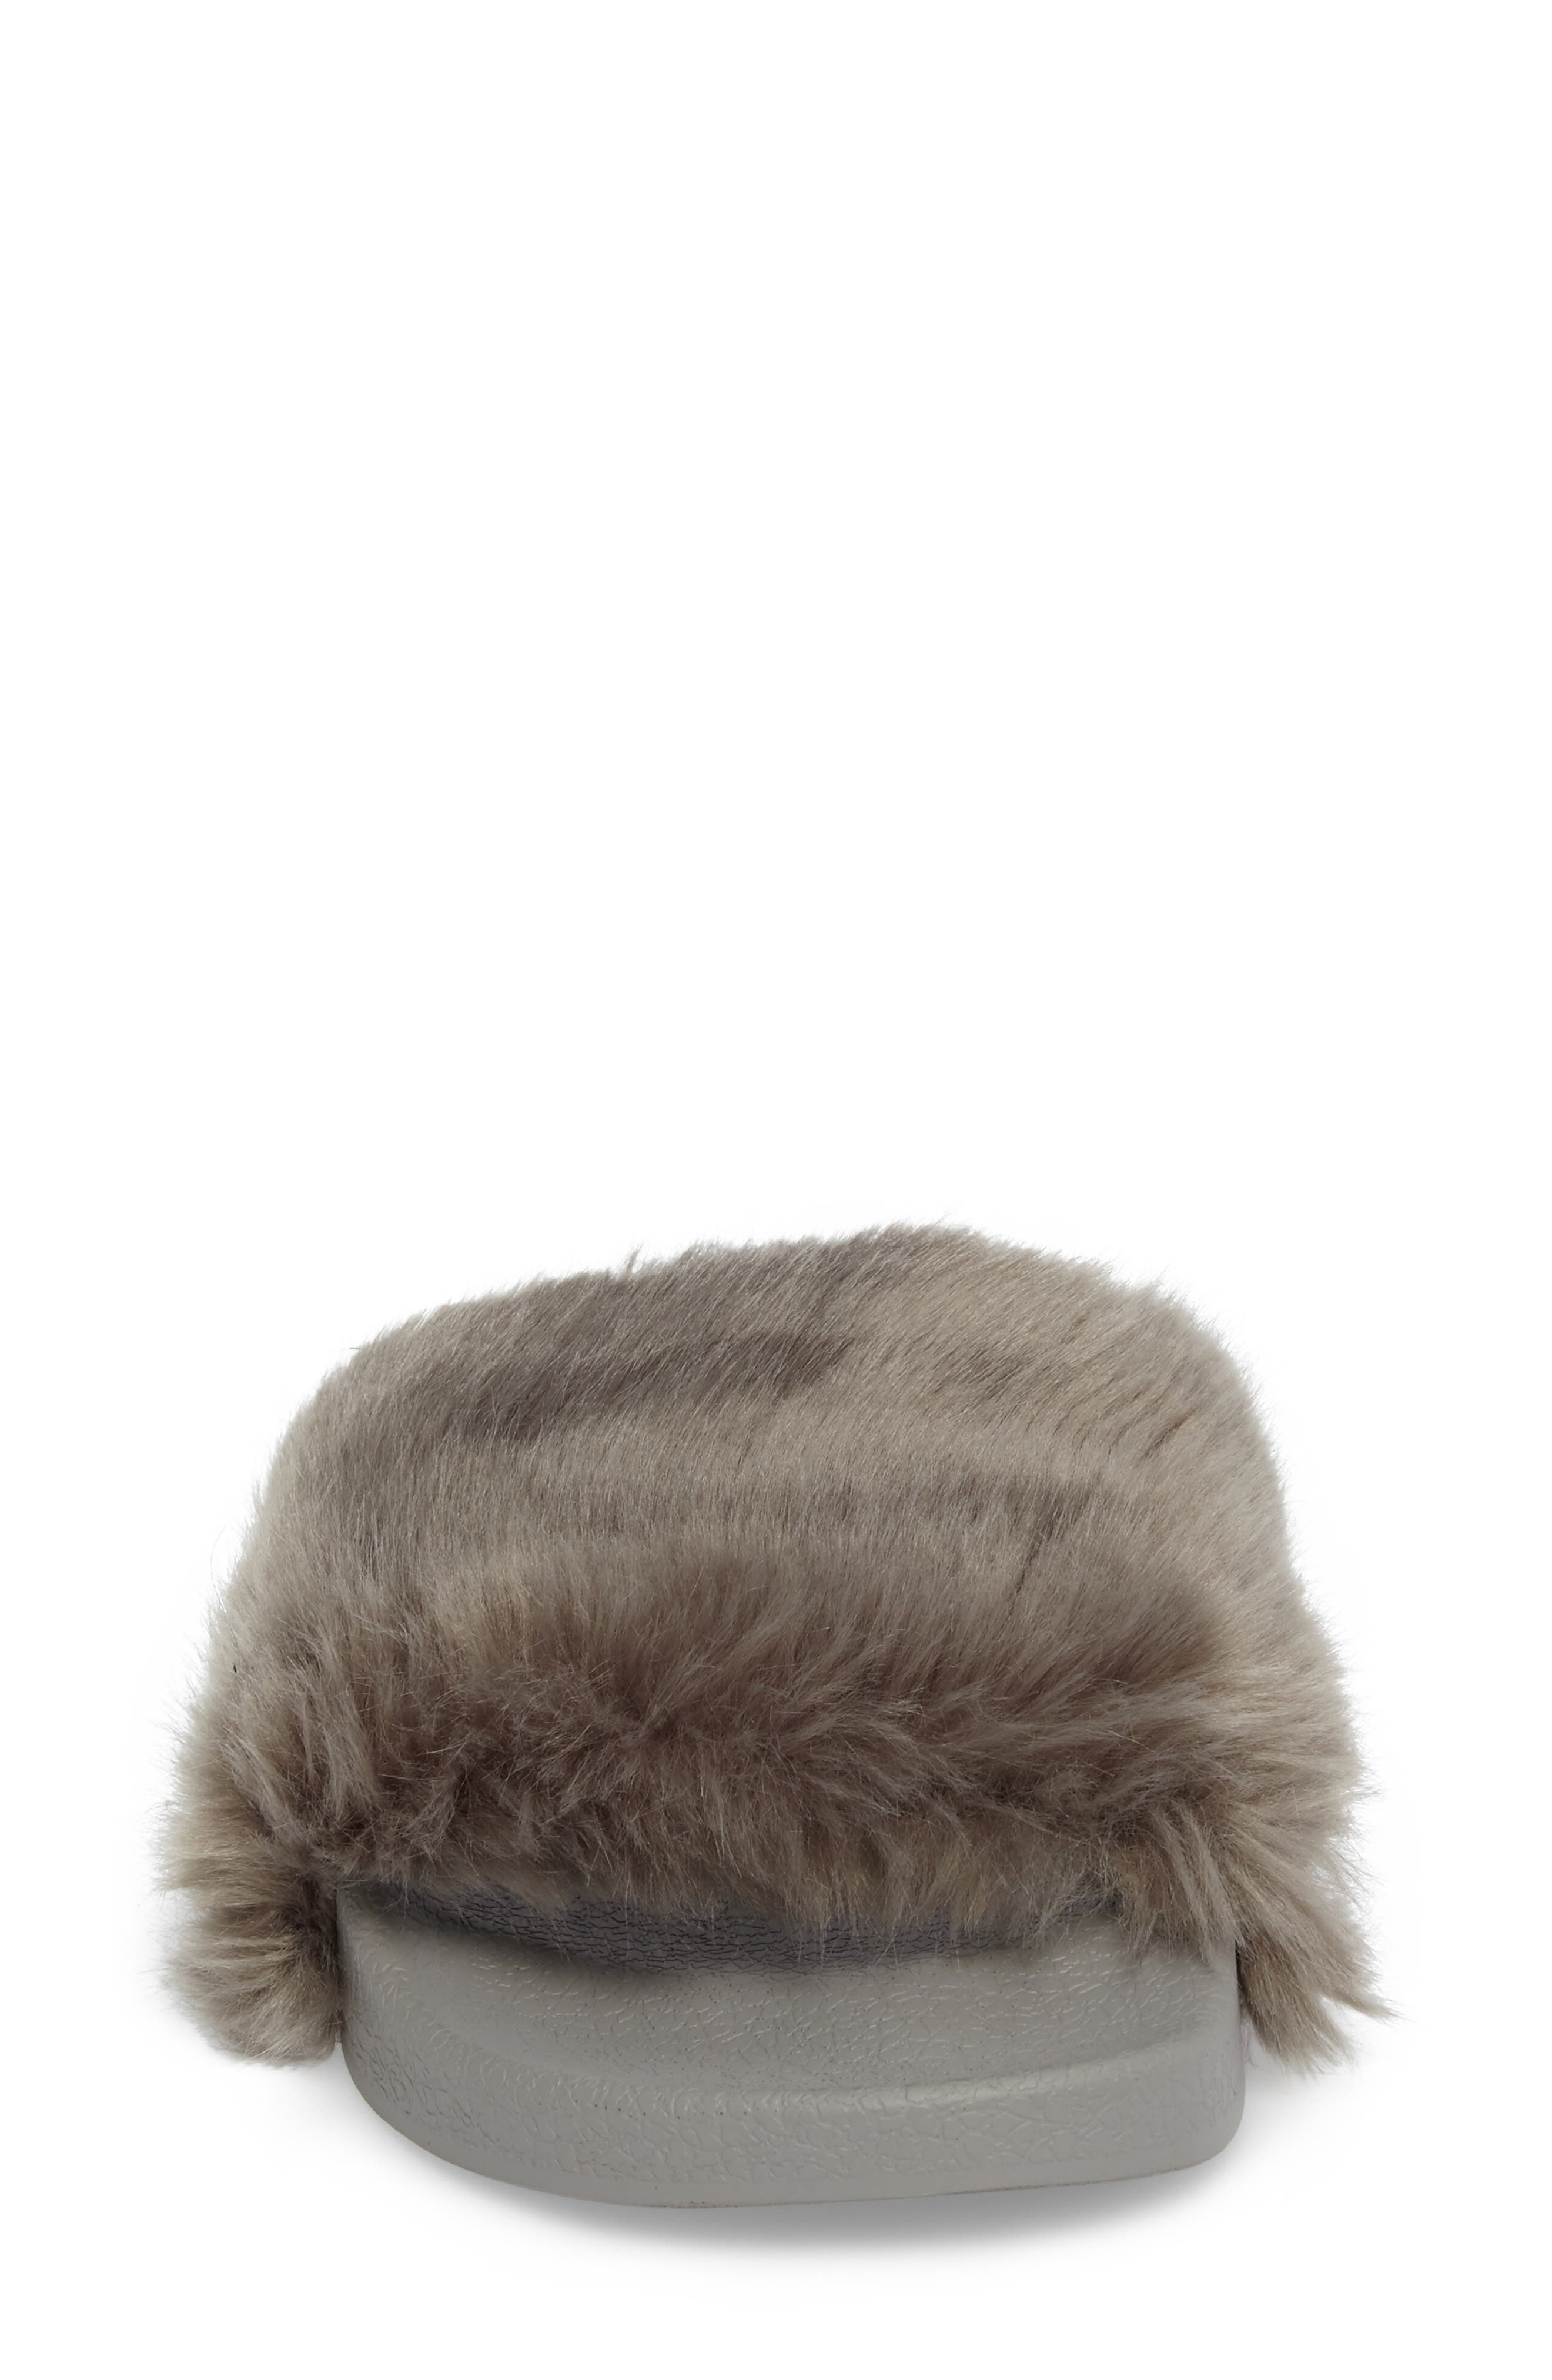 Vixen Slide Sandal,                             Alternate thumbnail 4, color,                             Grey Faux Fur